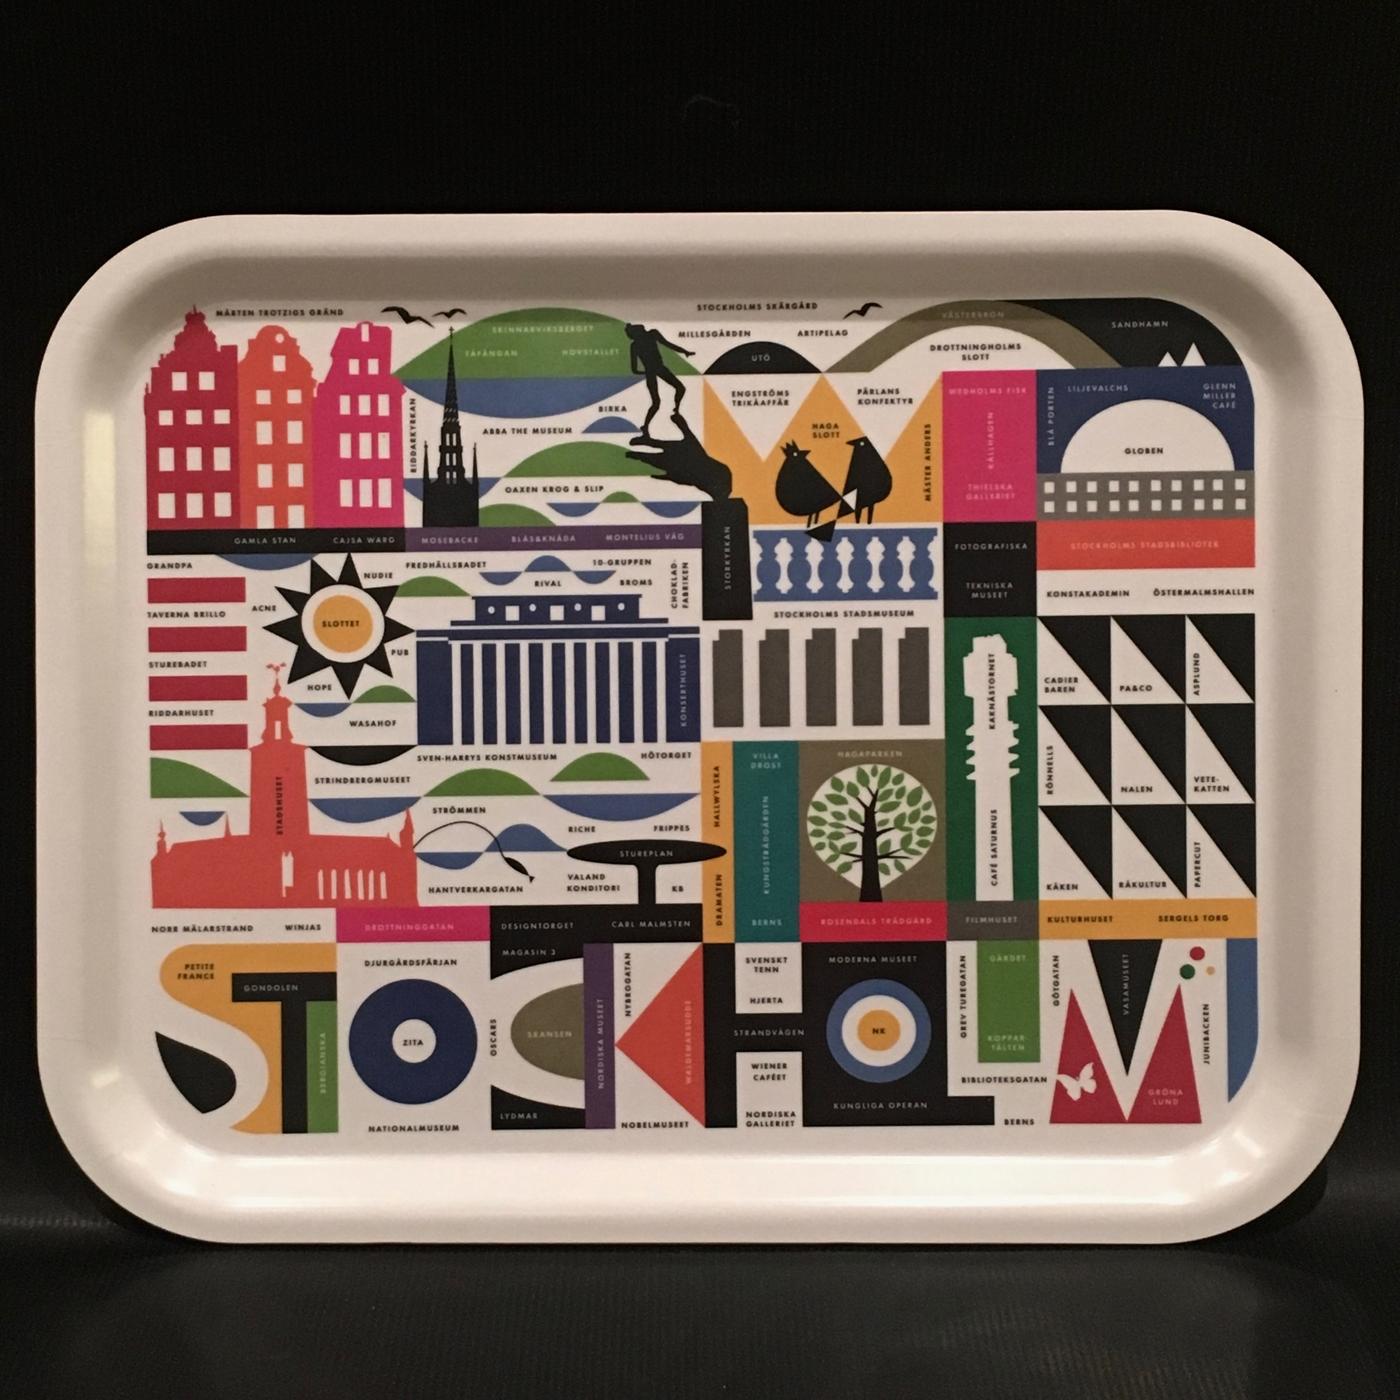 Stora Stockholm